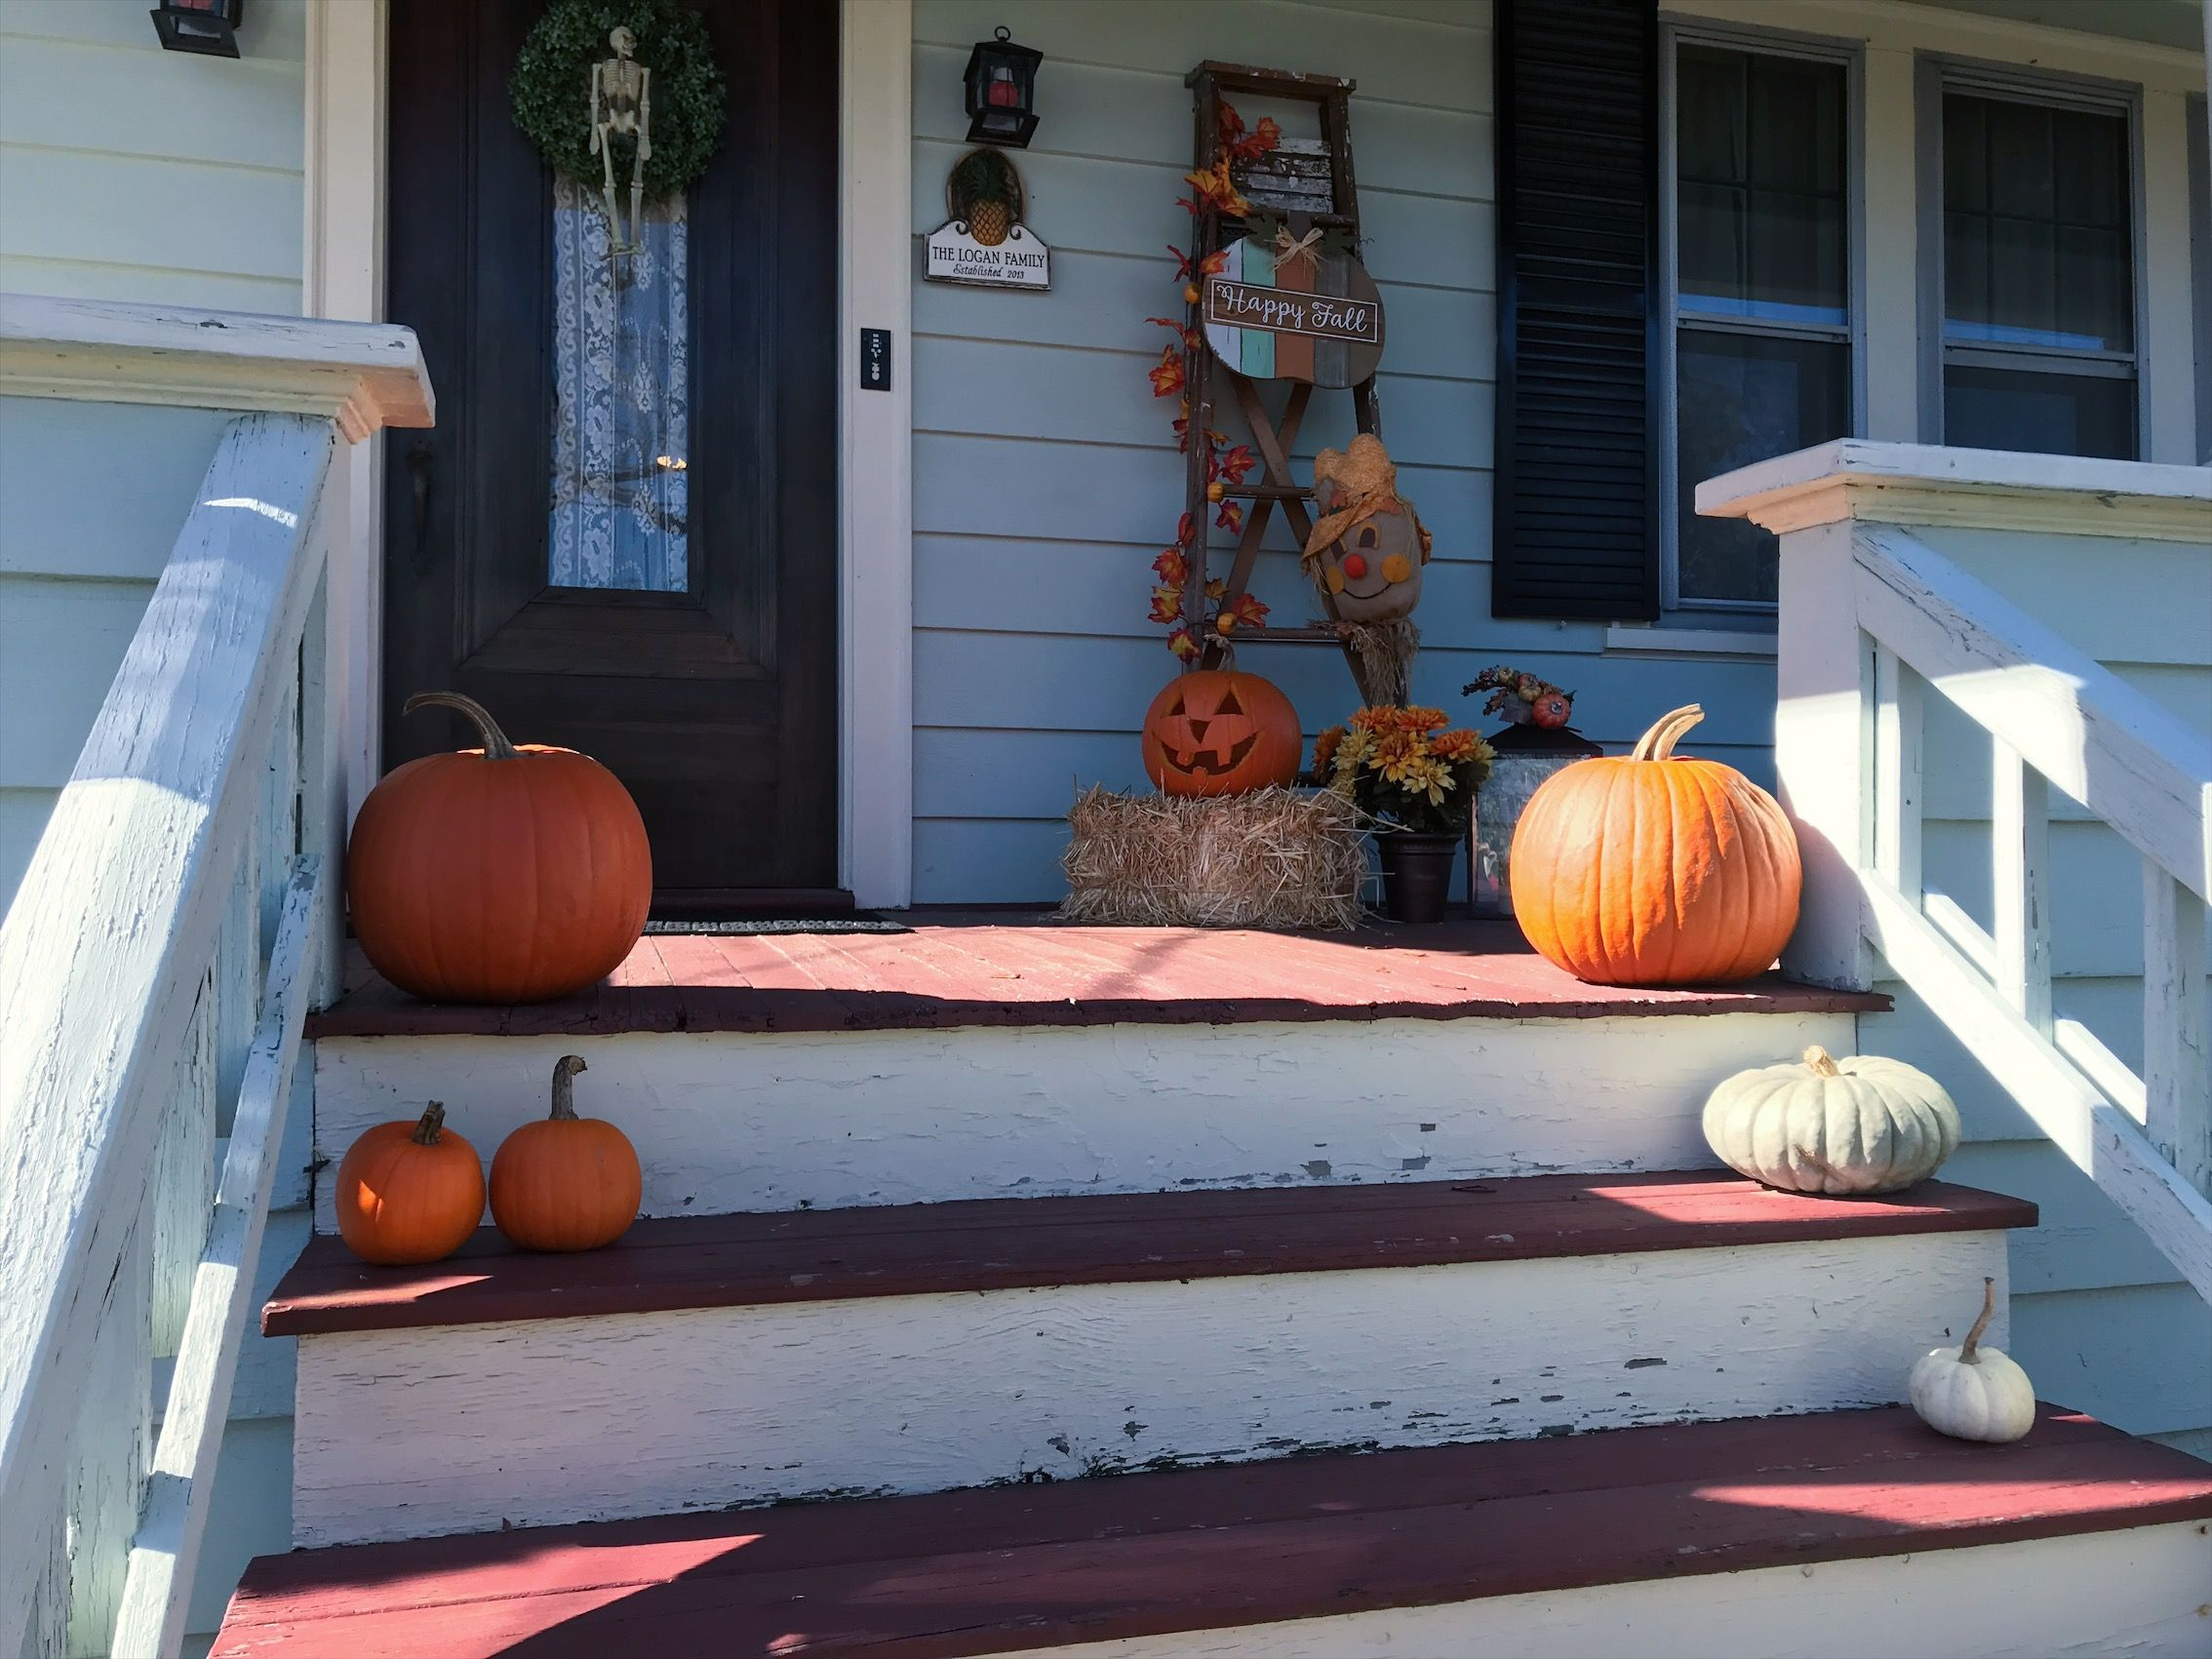 Fall front porch pumpkins vintage ladder decor boxwood wreath